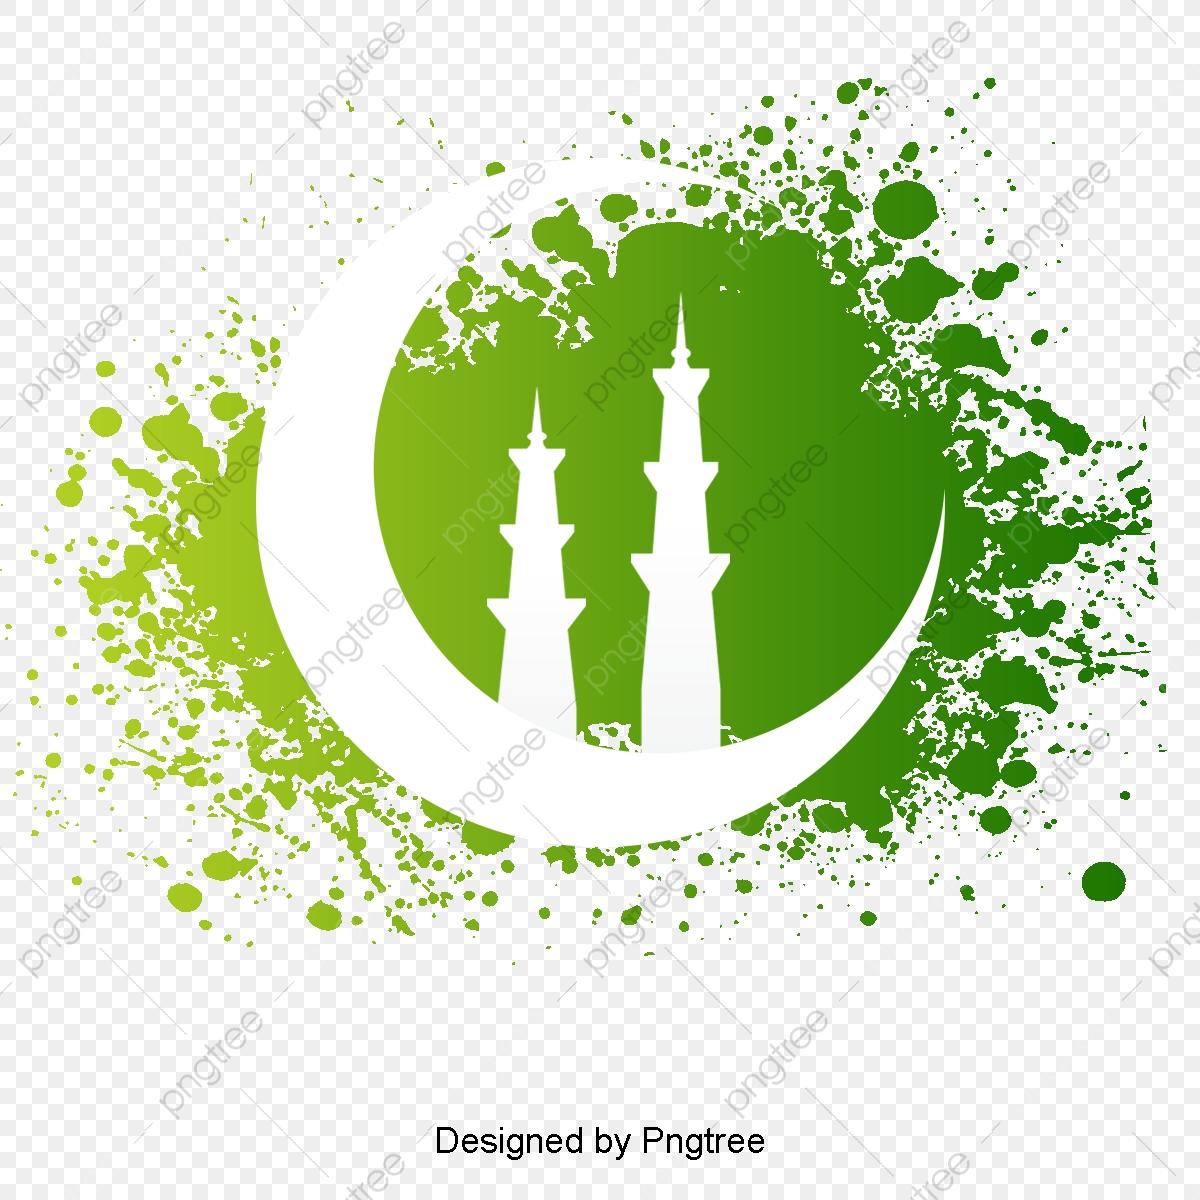 Islamic Material, Islamic, Muslim Culture, Religion PNG.